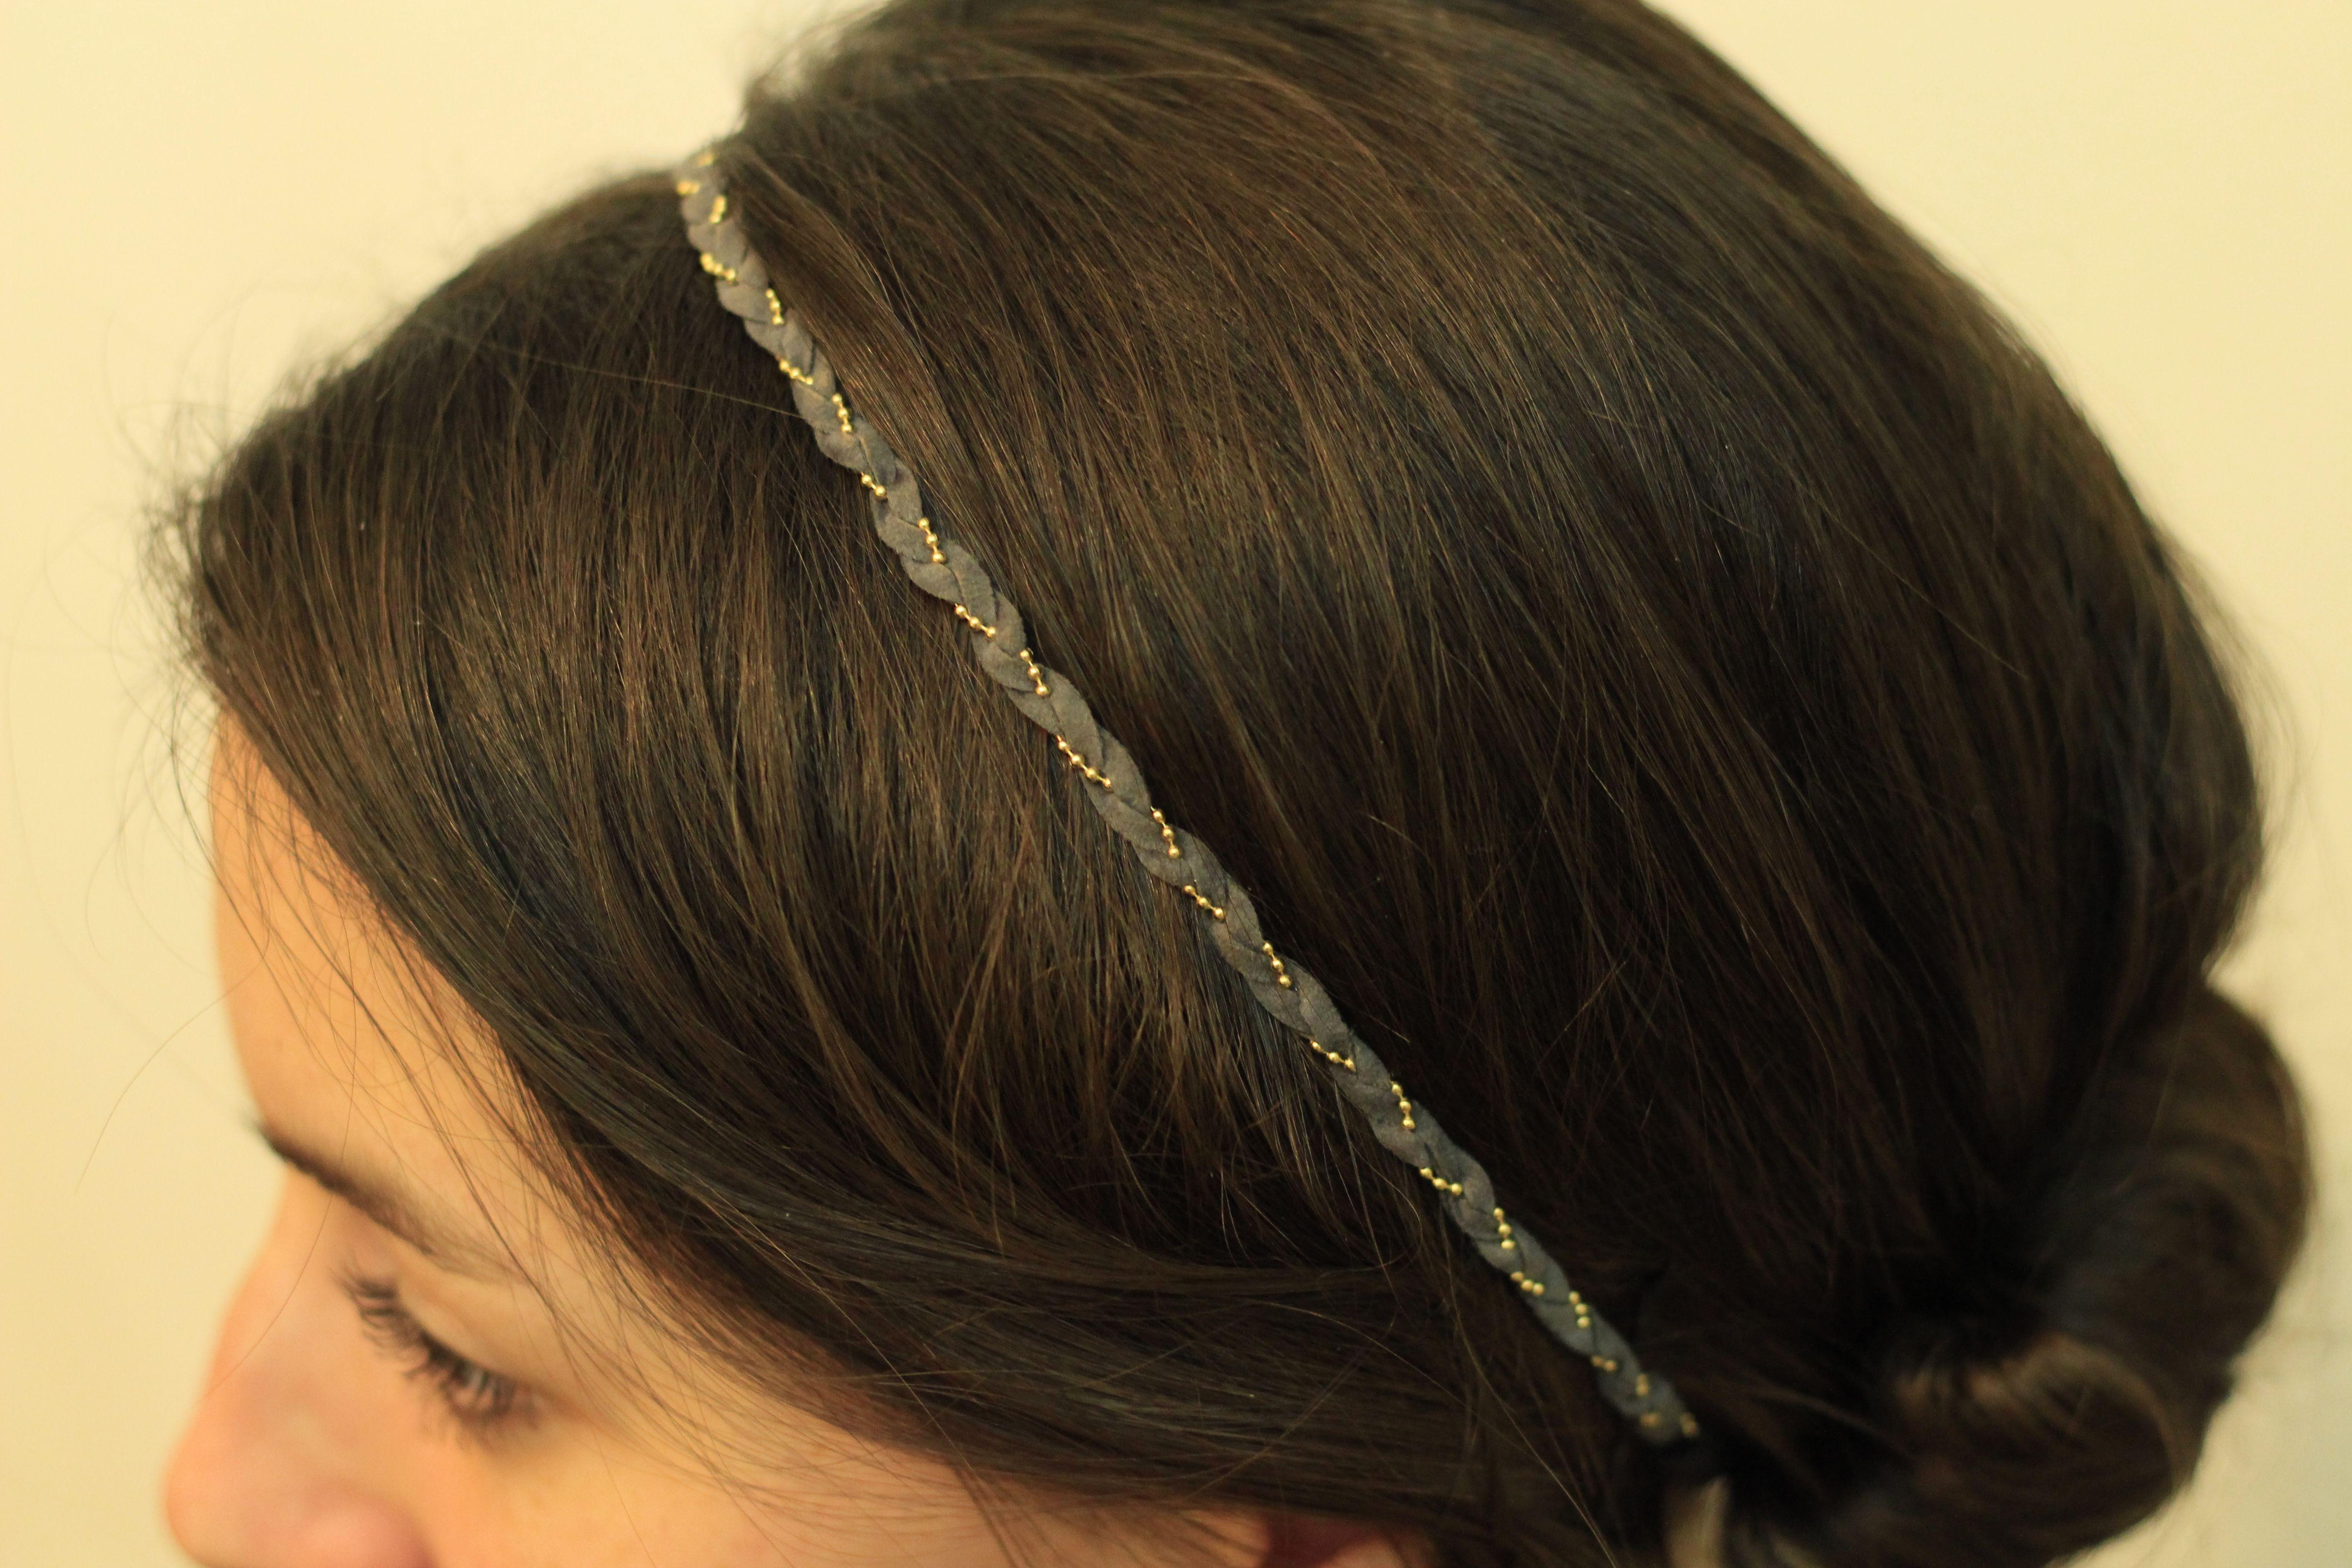 Headband Suedine Anthracite -- https://www.etsy.com/fr/listing/179060023/headband-suedine-anthracite?ref=related-1